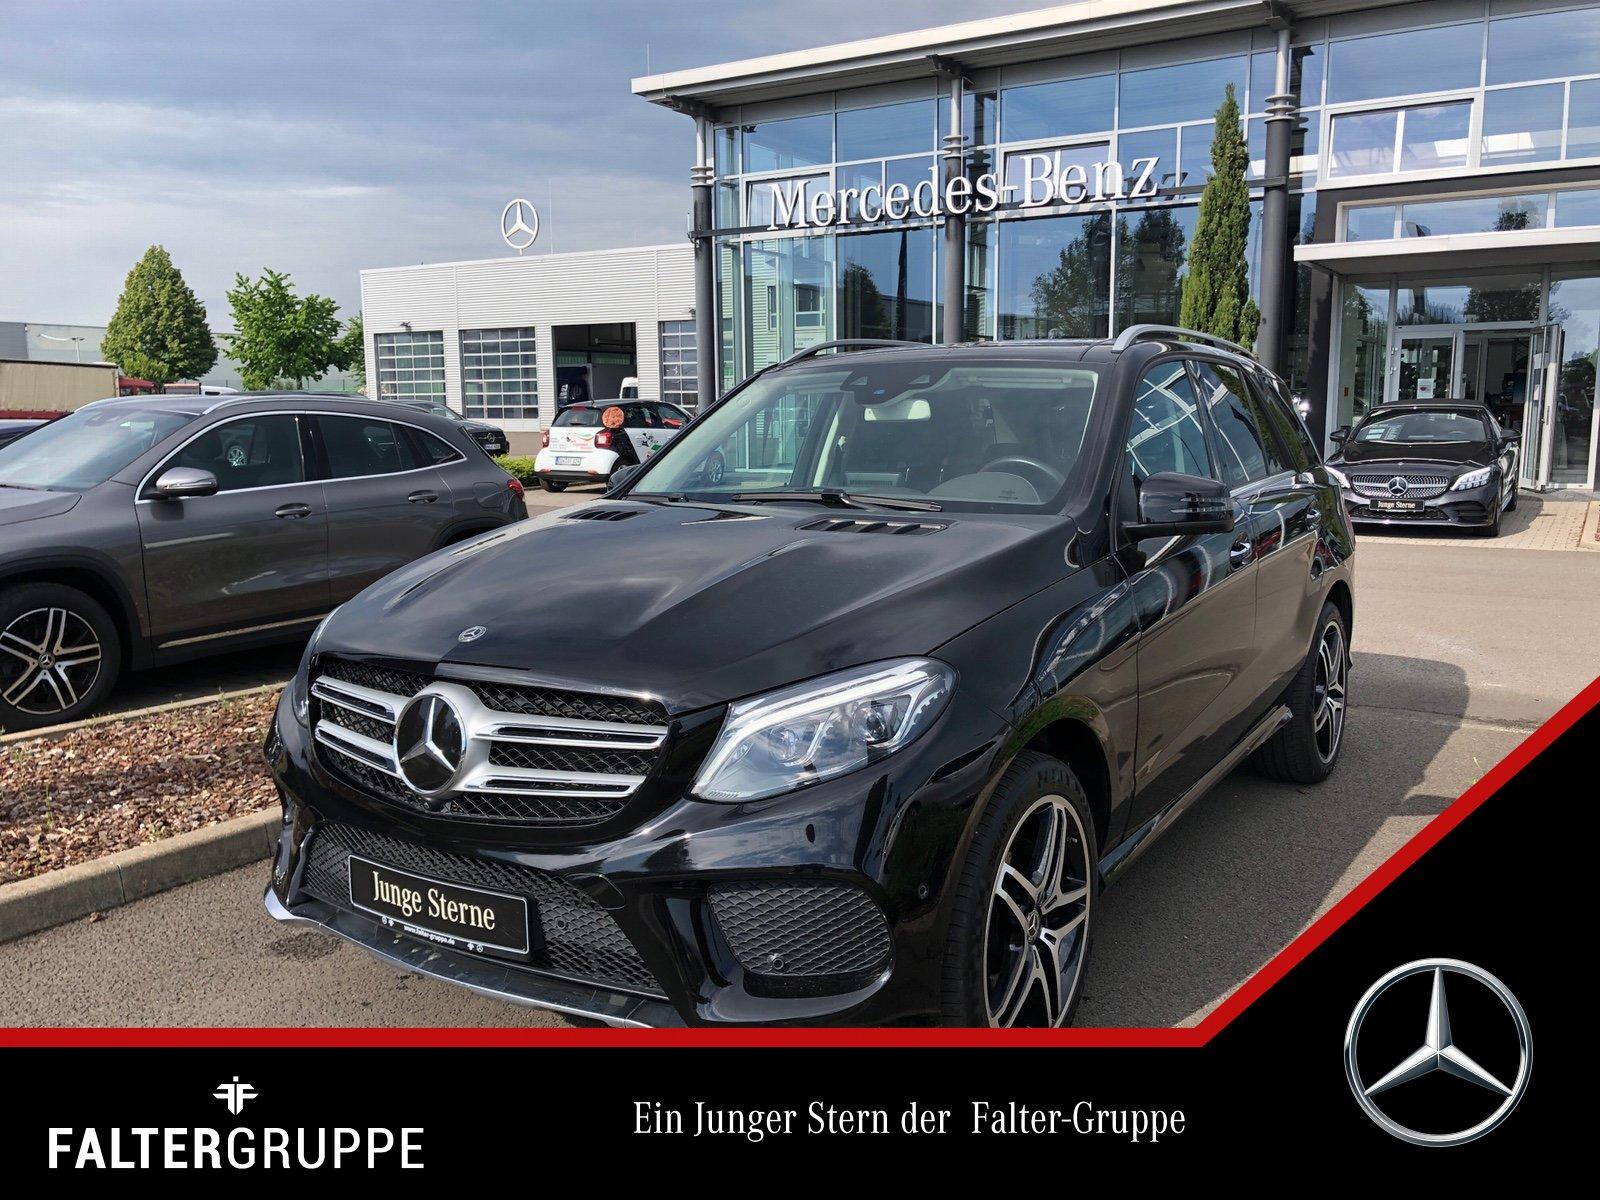 Mercedes-Benz GLE 500 121585-AMG HifiB&O DISTR Pano AHK Exclu, Jahr 2018, Benzin